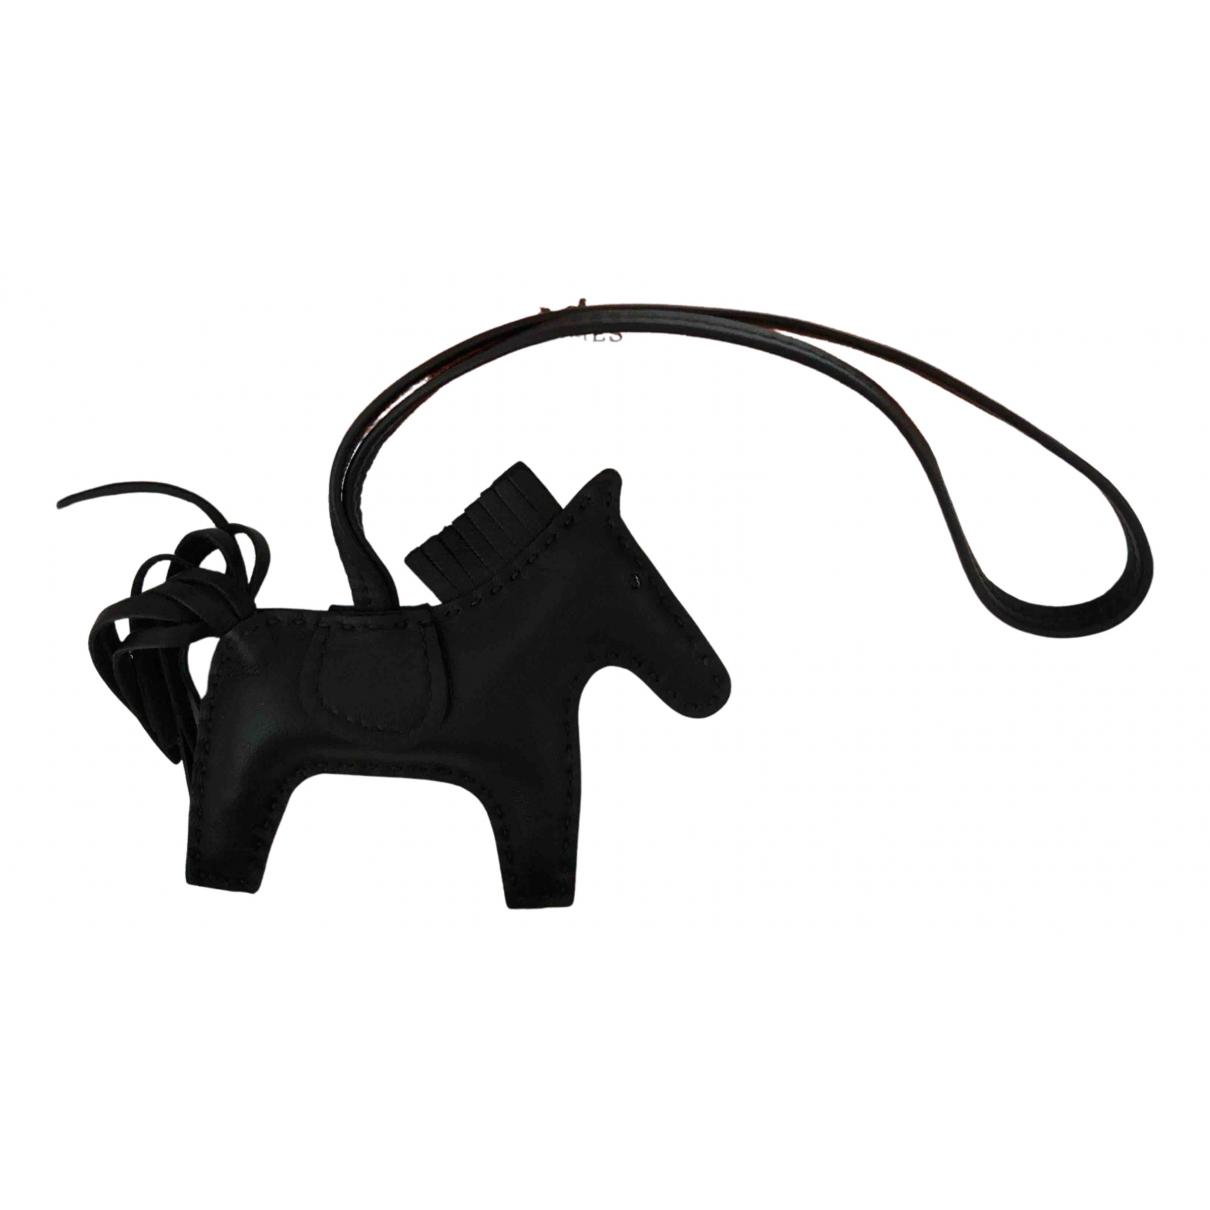 Hermes Rodeo Taschenschmuck in  Schwarz Leder